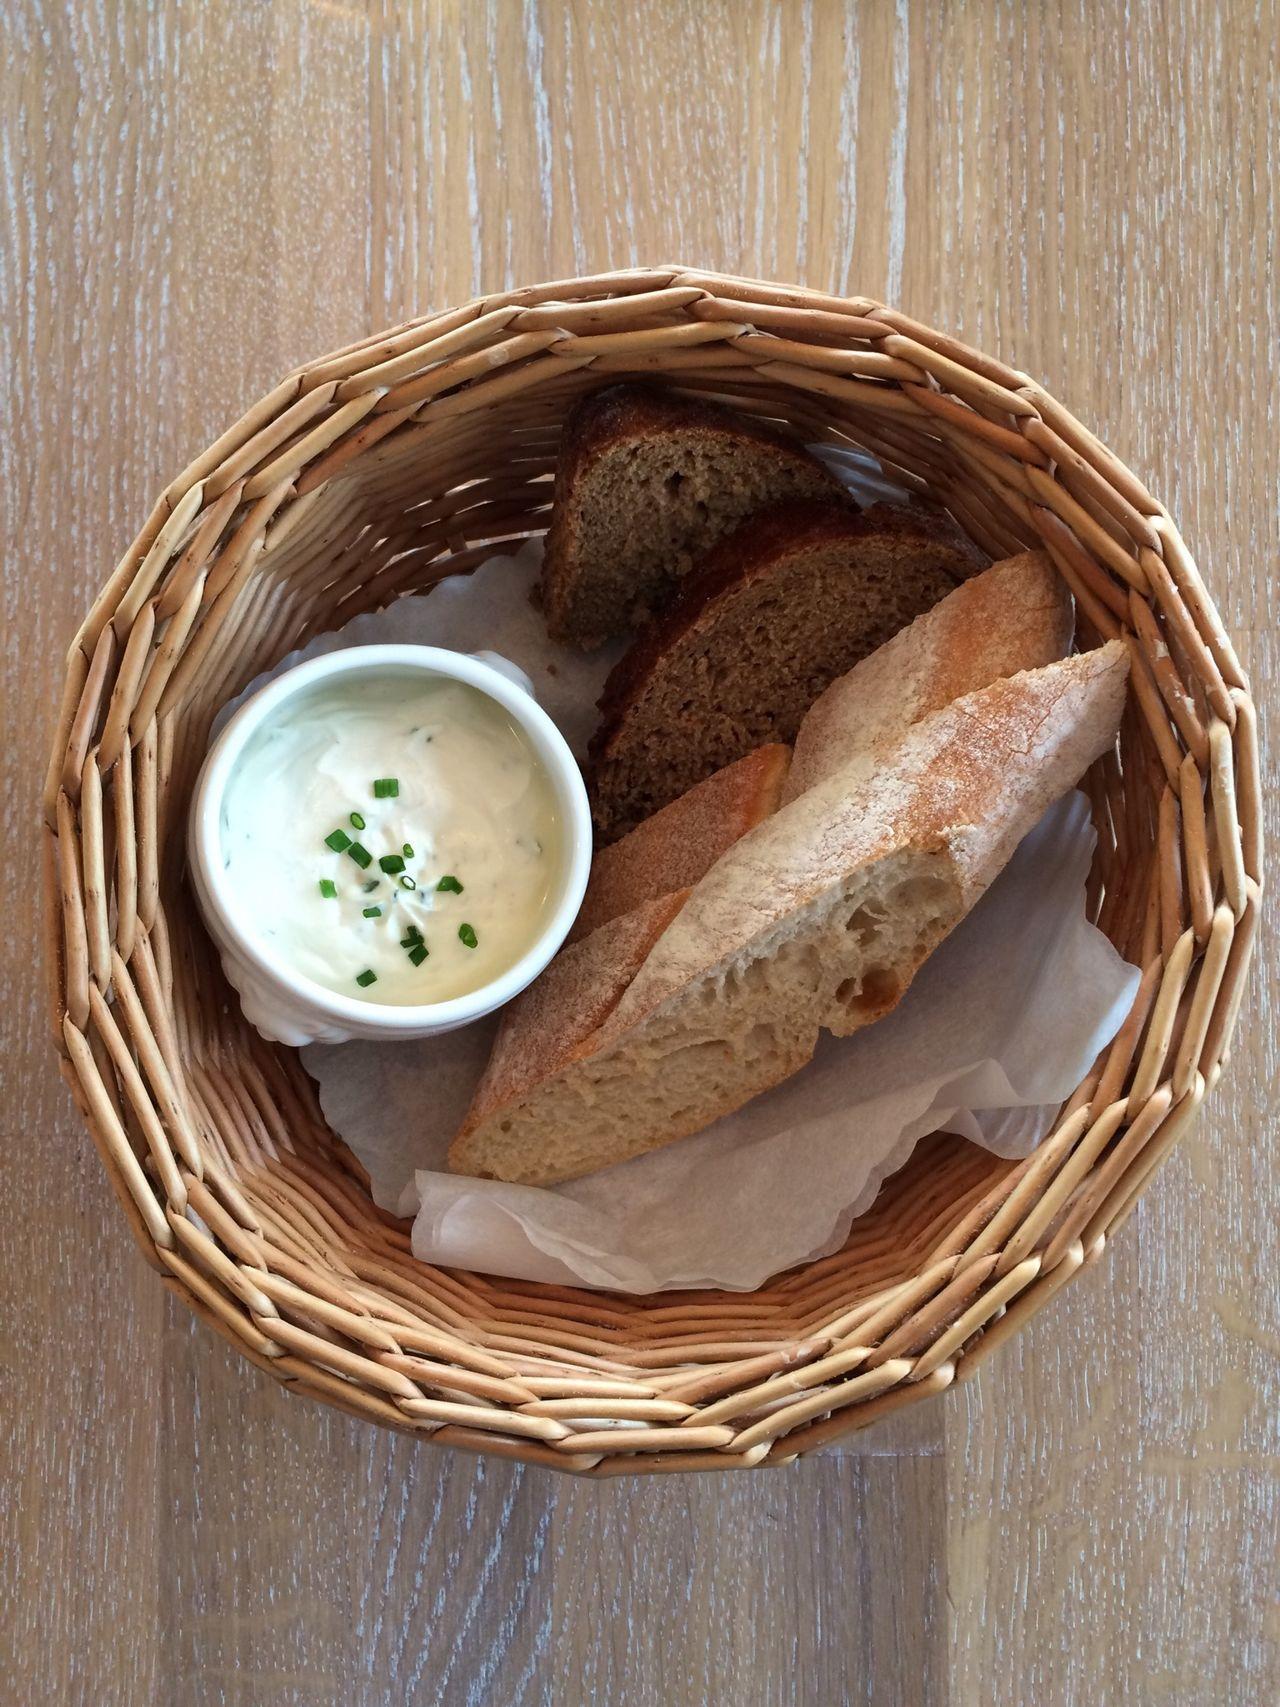 Beautiful stock photos of bread, Bad Vilbel, Baked Good, Basket, Bread